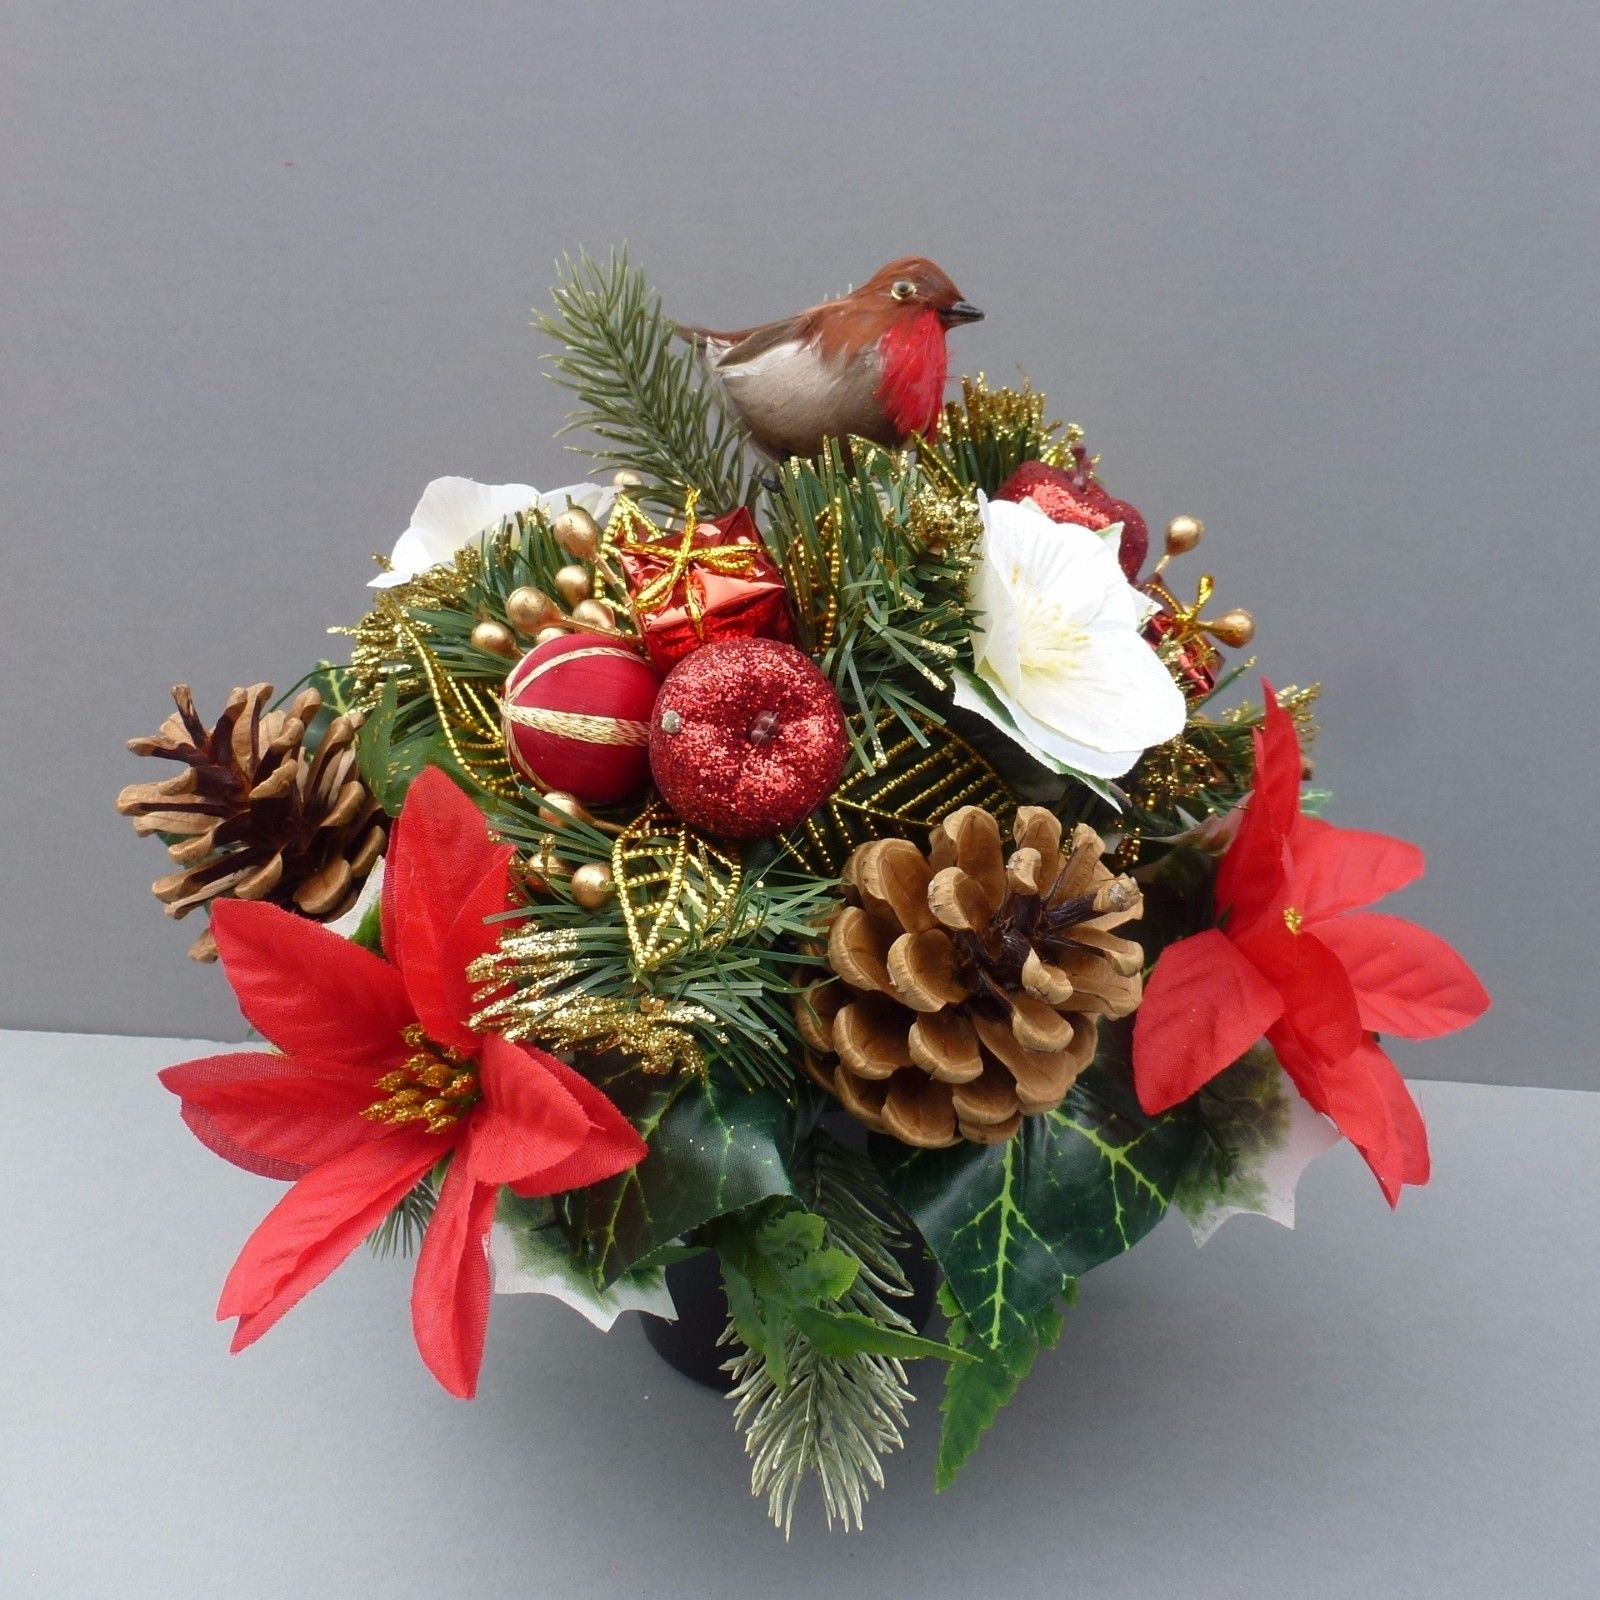 Christmas Grave Decorations Uk: Artificial Flower Wedding Decorations, Hanging Baskets